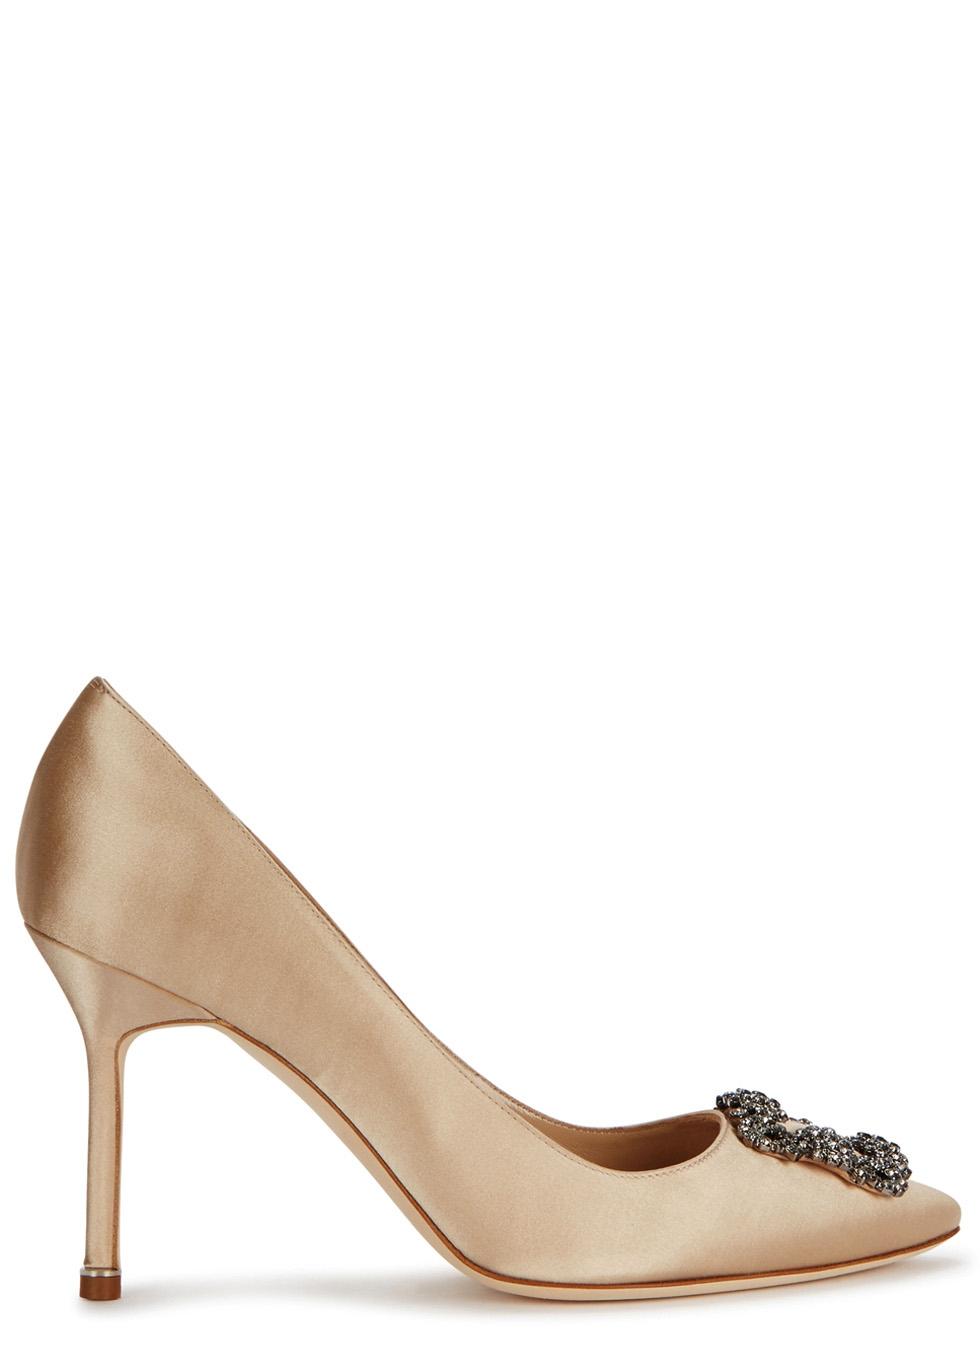 Latest Manolo Blahnik Fernus Sandals For Women Selling Well